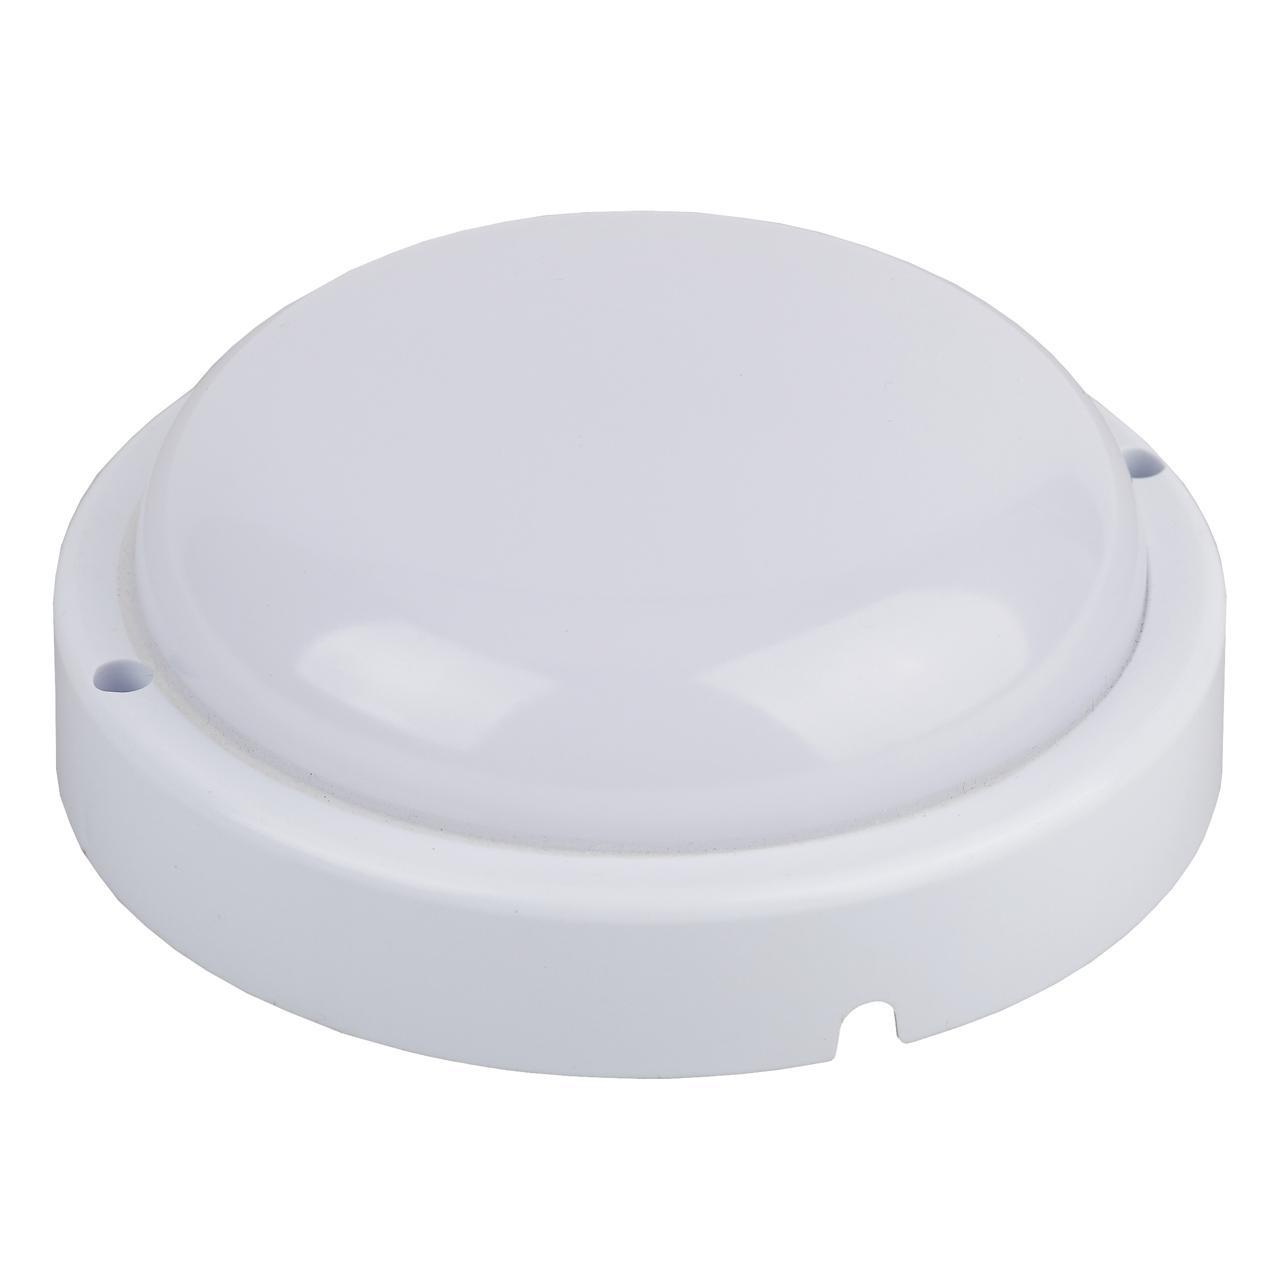 Уличный светильник Эра SPB-2-08-R, LED